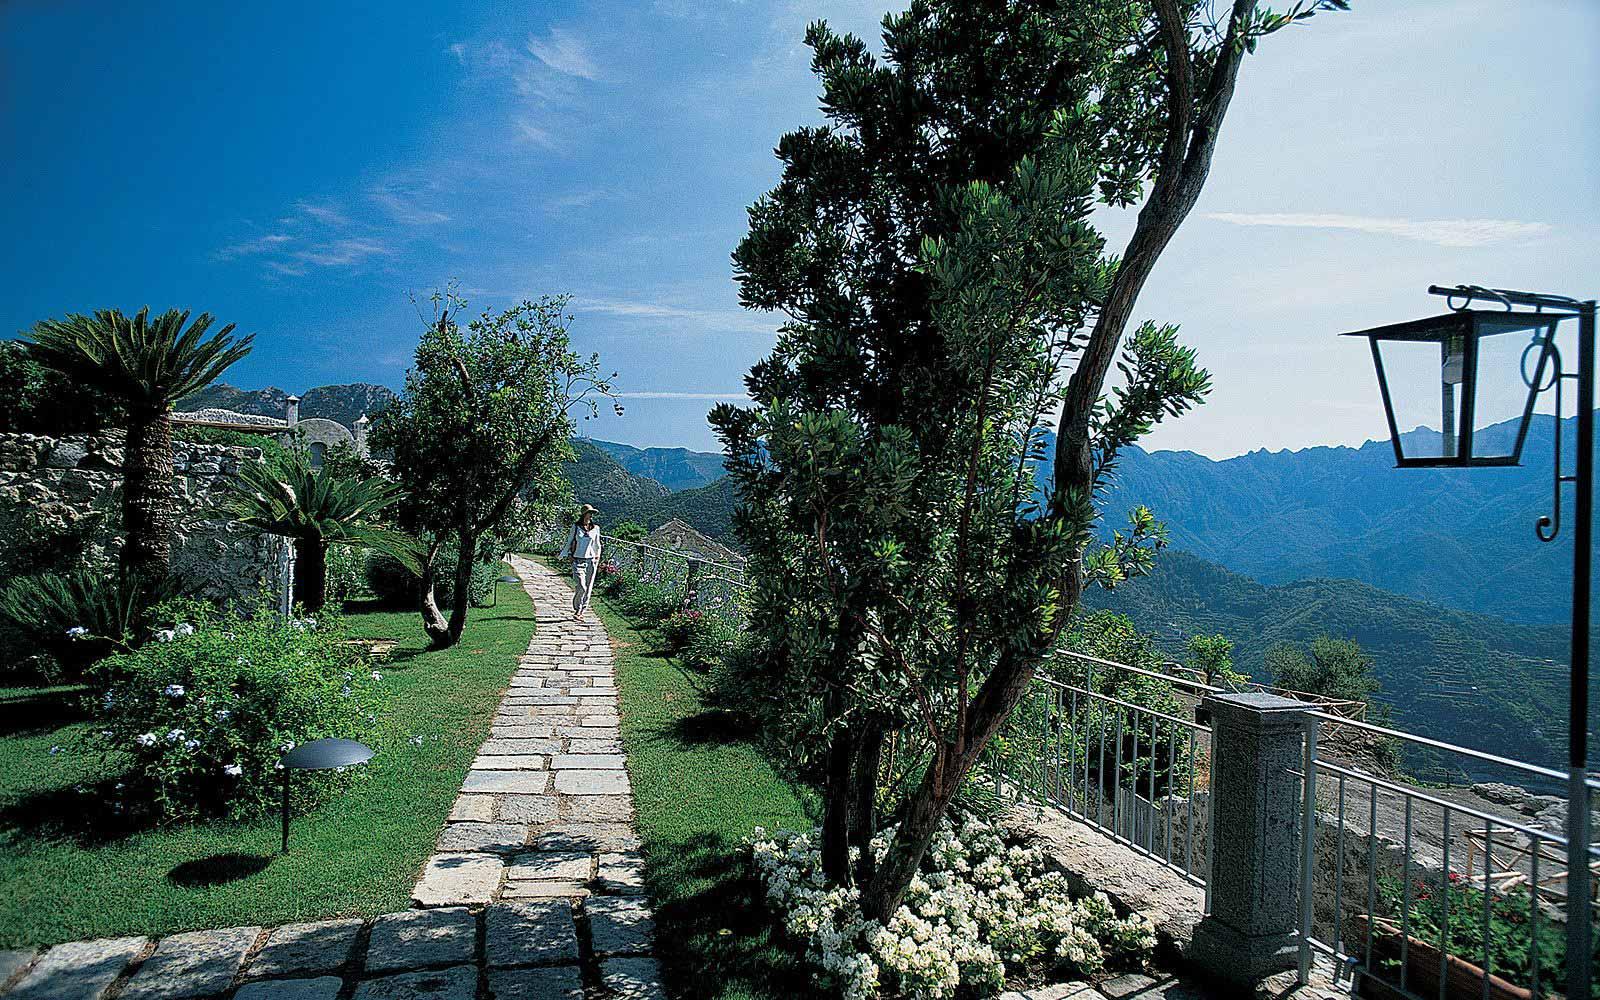 Gardens at the Belmond Hotel Caruso